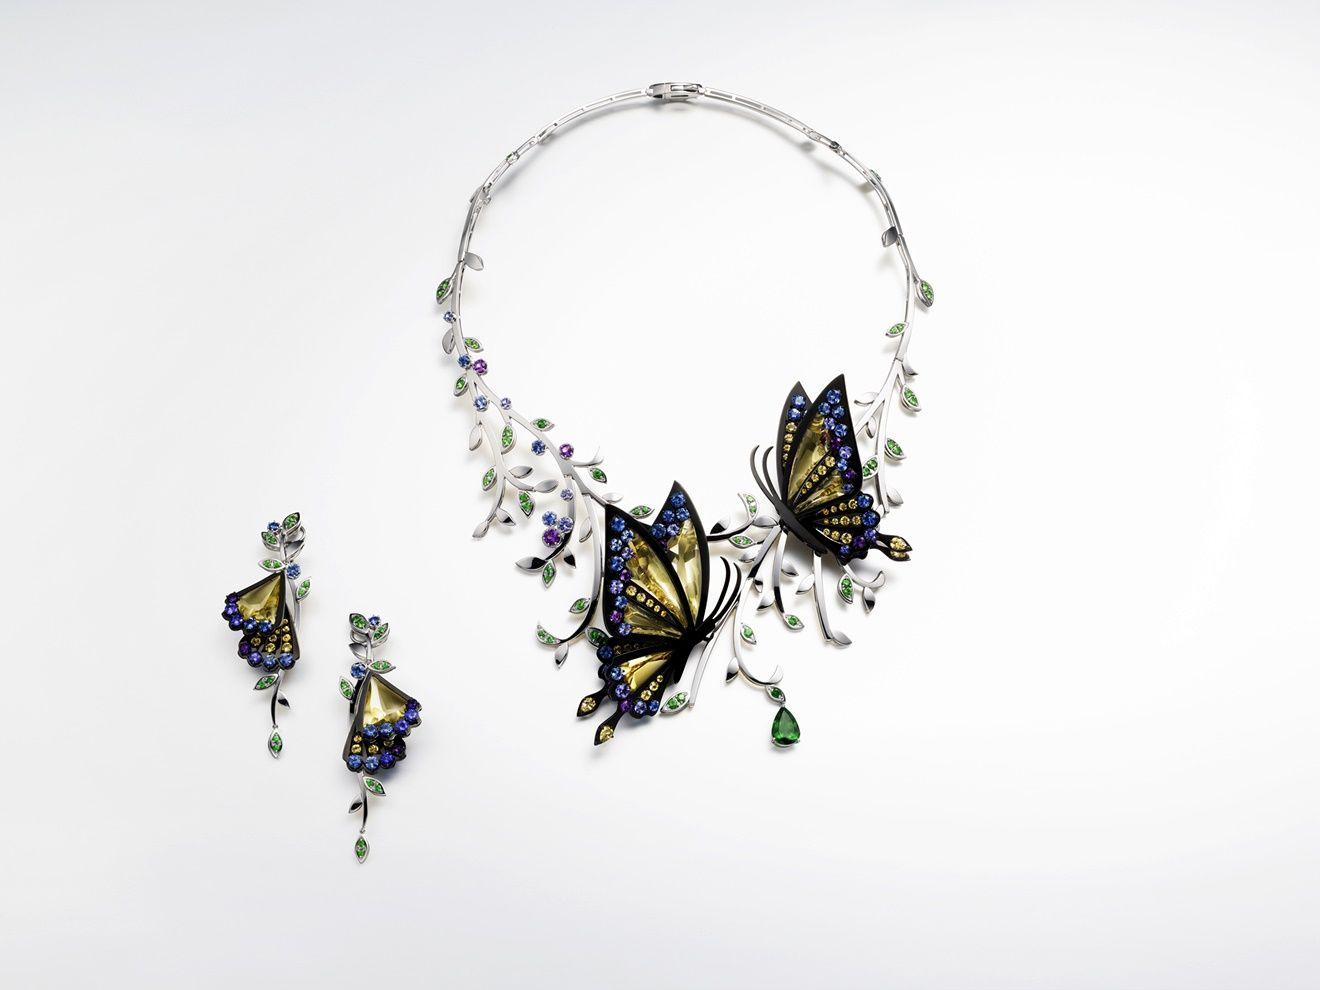 operatic diva 彩寶項鍊與耳環by Tasaki。